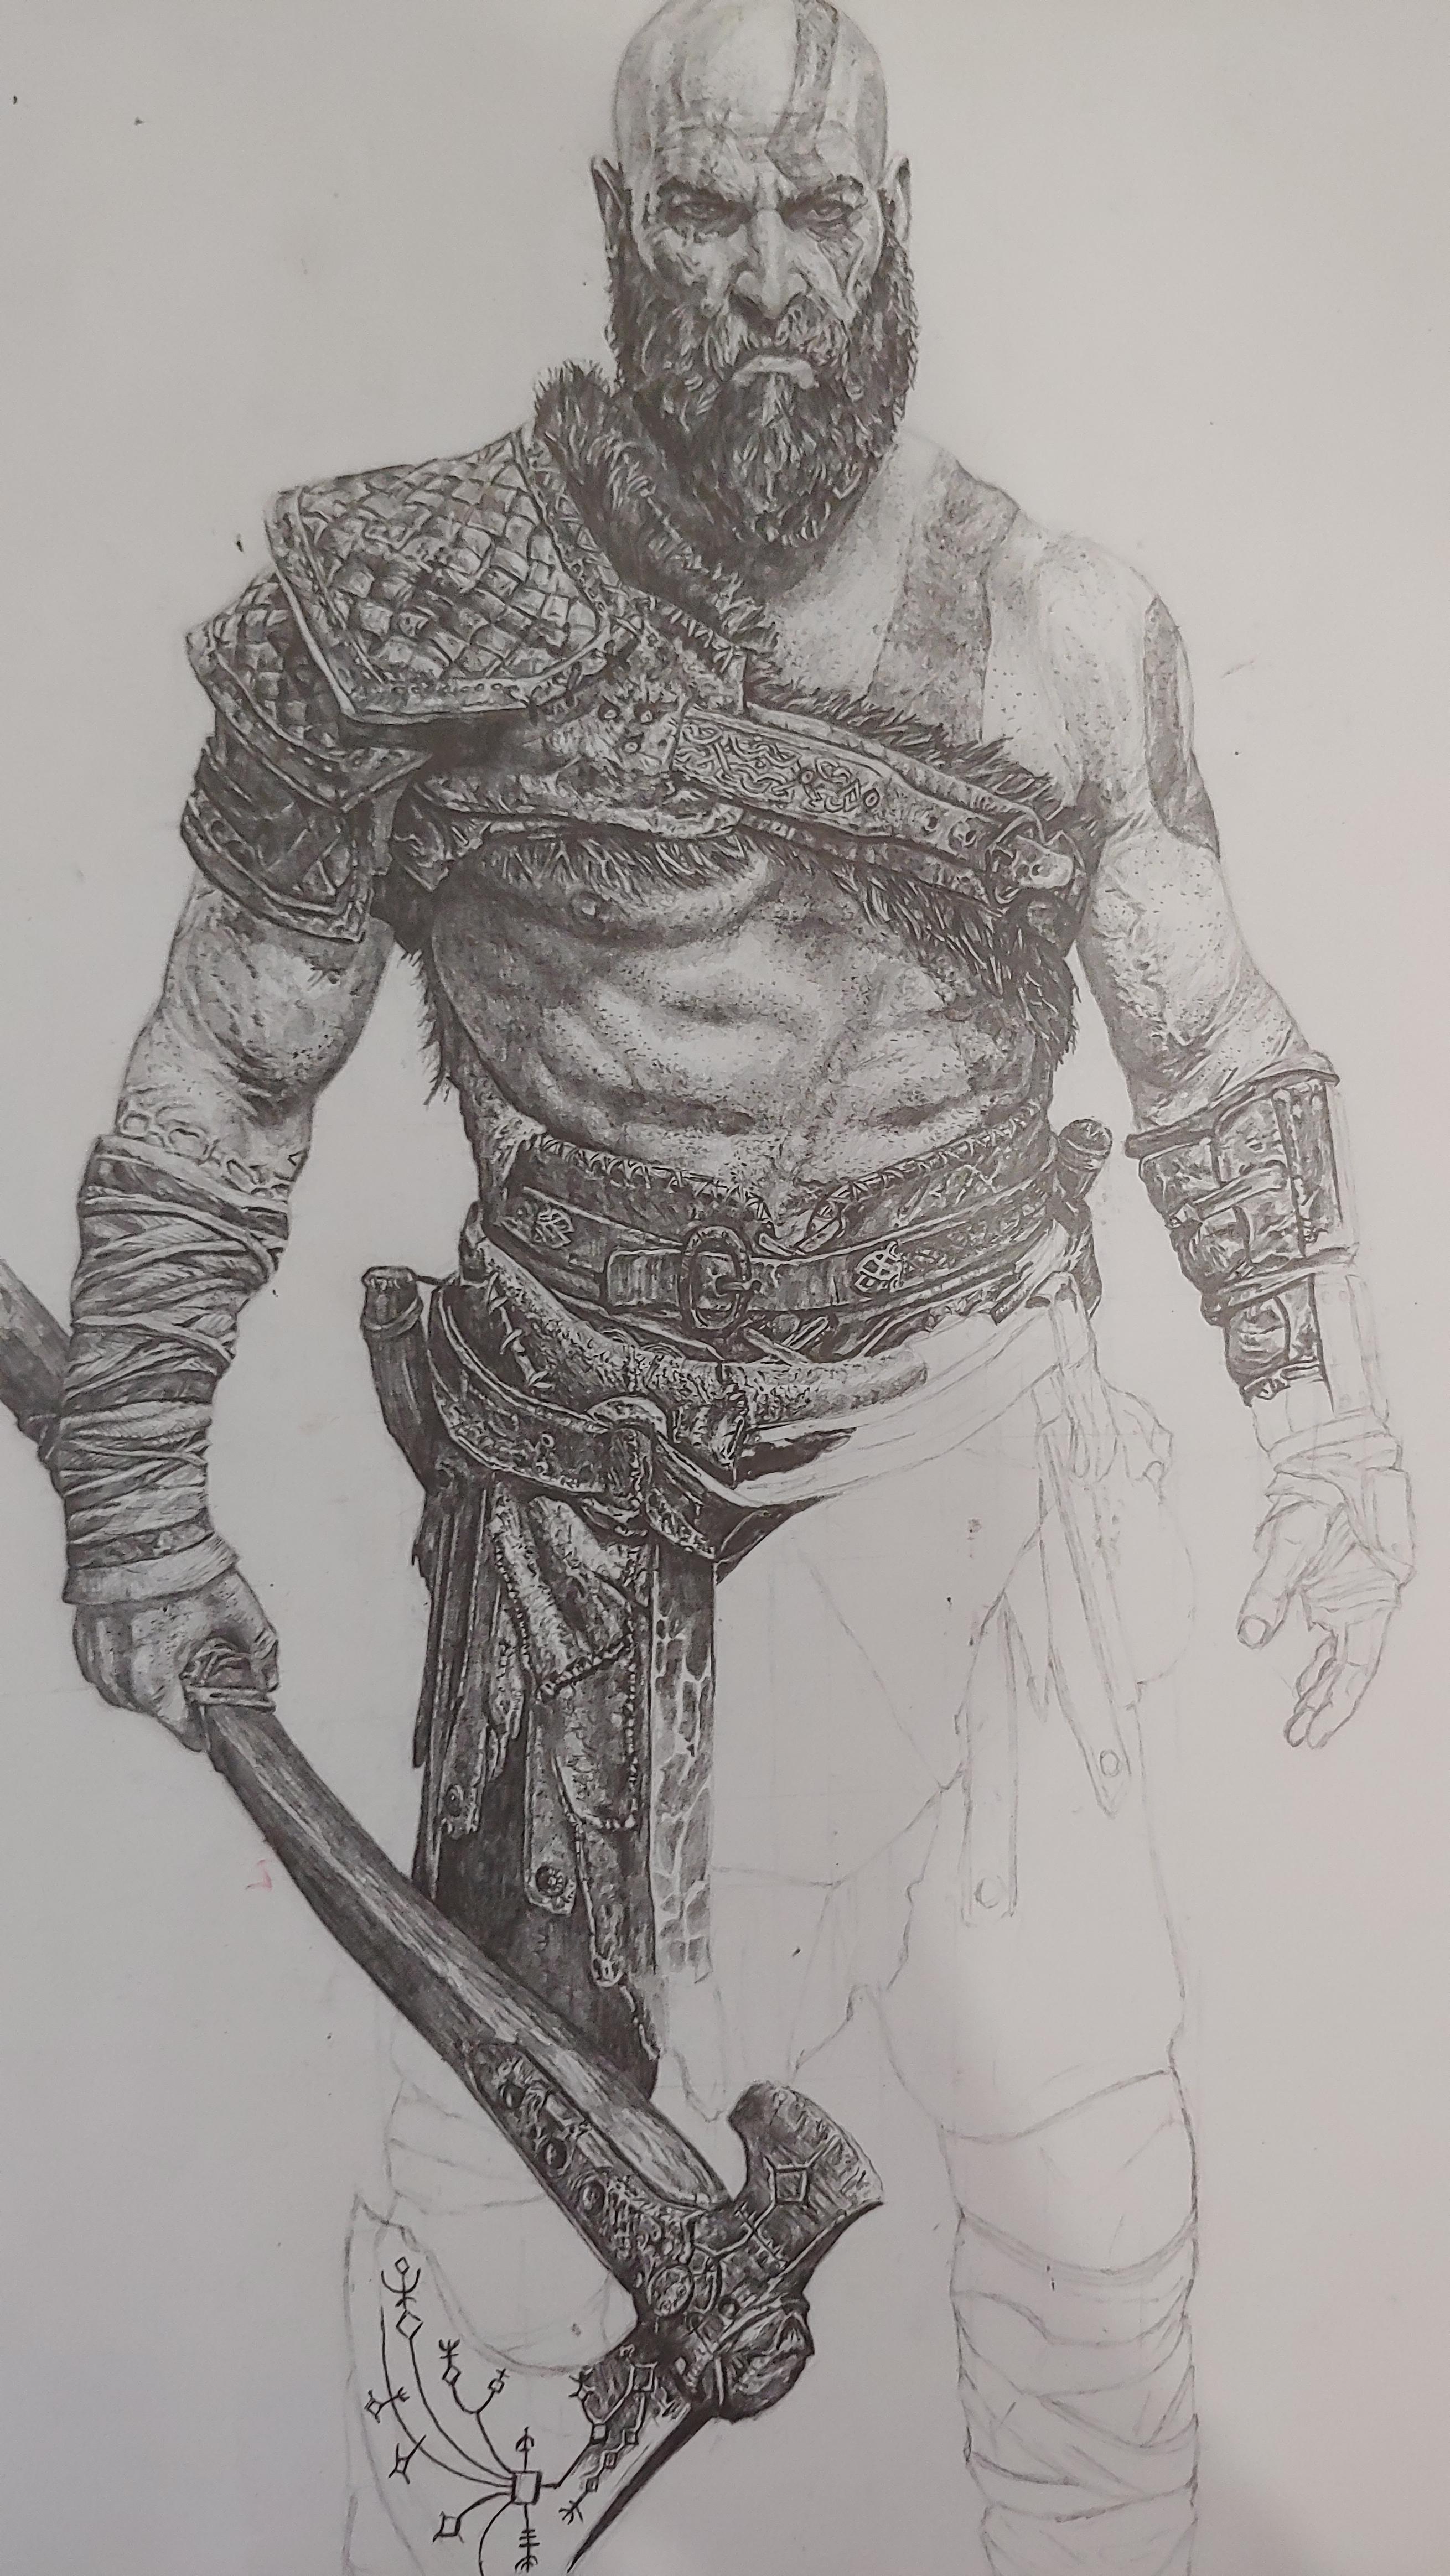 How To Draw Kratos : kratos, Work-in-progress, Kratos., Drawing, Existing, Image, Original, Artworks, GodofWar